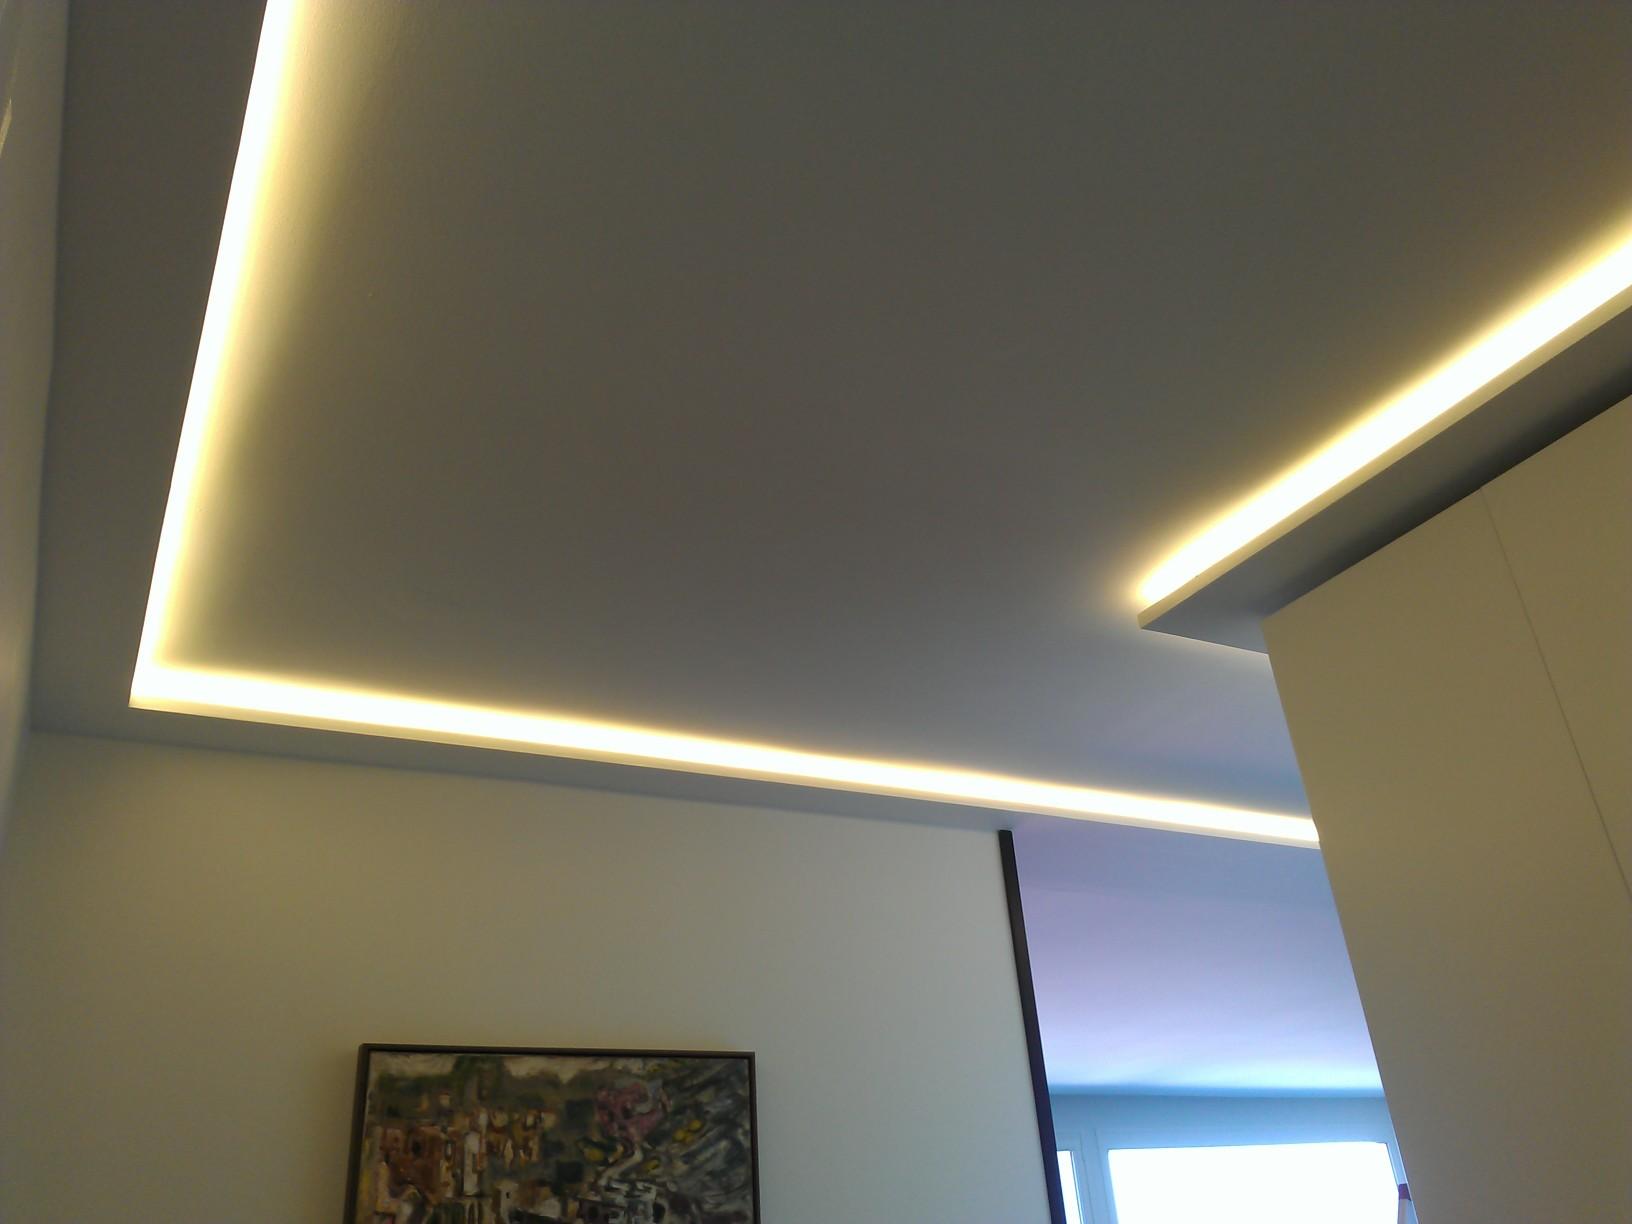 D coration gorge lumineuse led 77 brest gorge for Decoration faux plafond avec gorge lumineuse